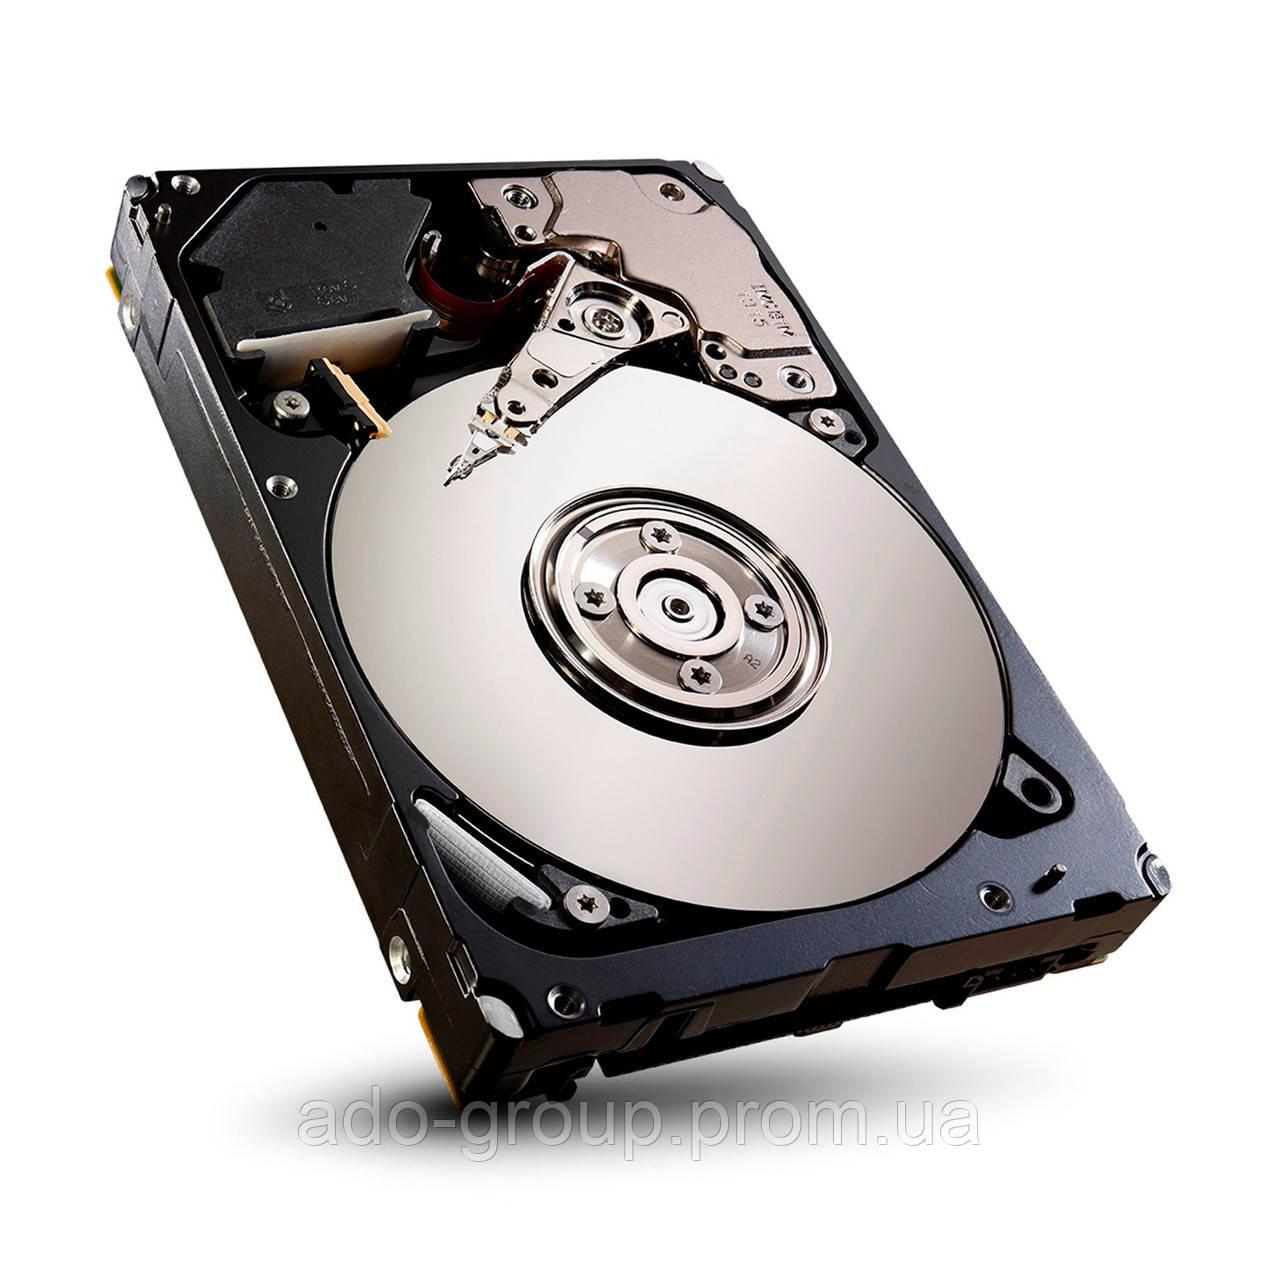 "AP871A Жесткий диск HP 450GB SAS 15K  3.5"" +"